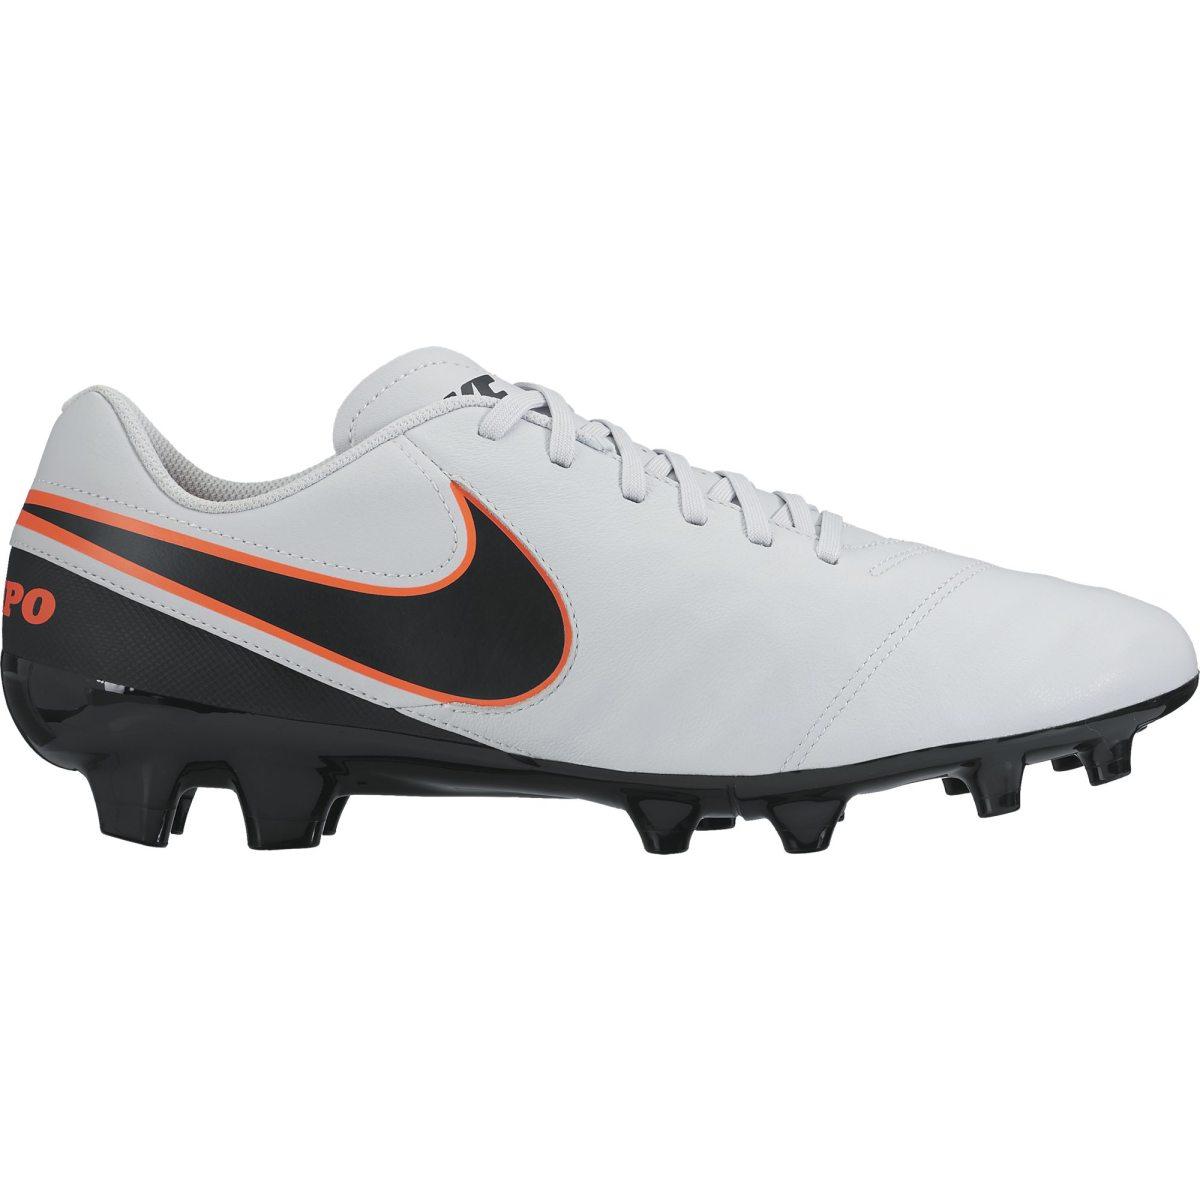 premium selection cbd4d a6c39 nike tiempo genio ii leather fg q1 16 fotbollssko senior fotbollsskor